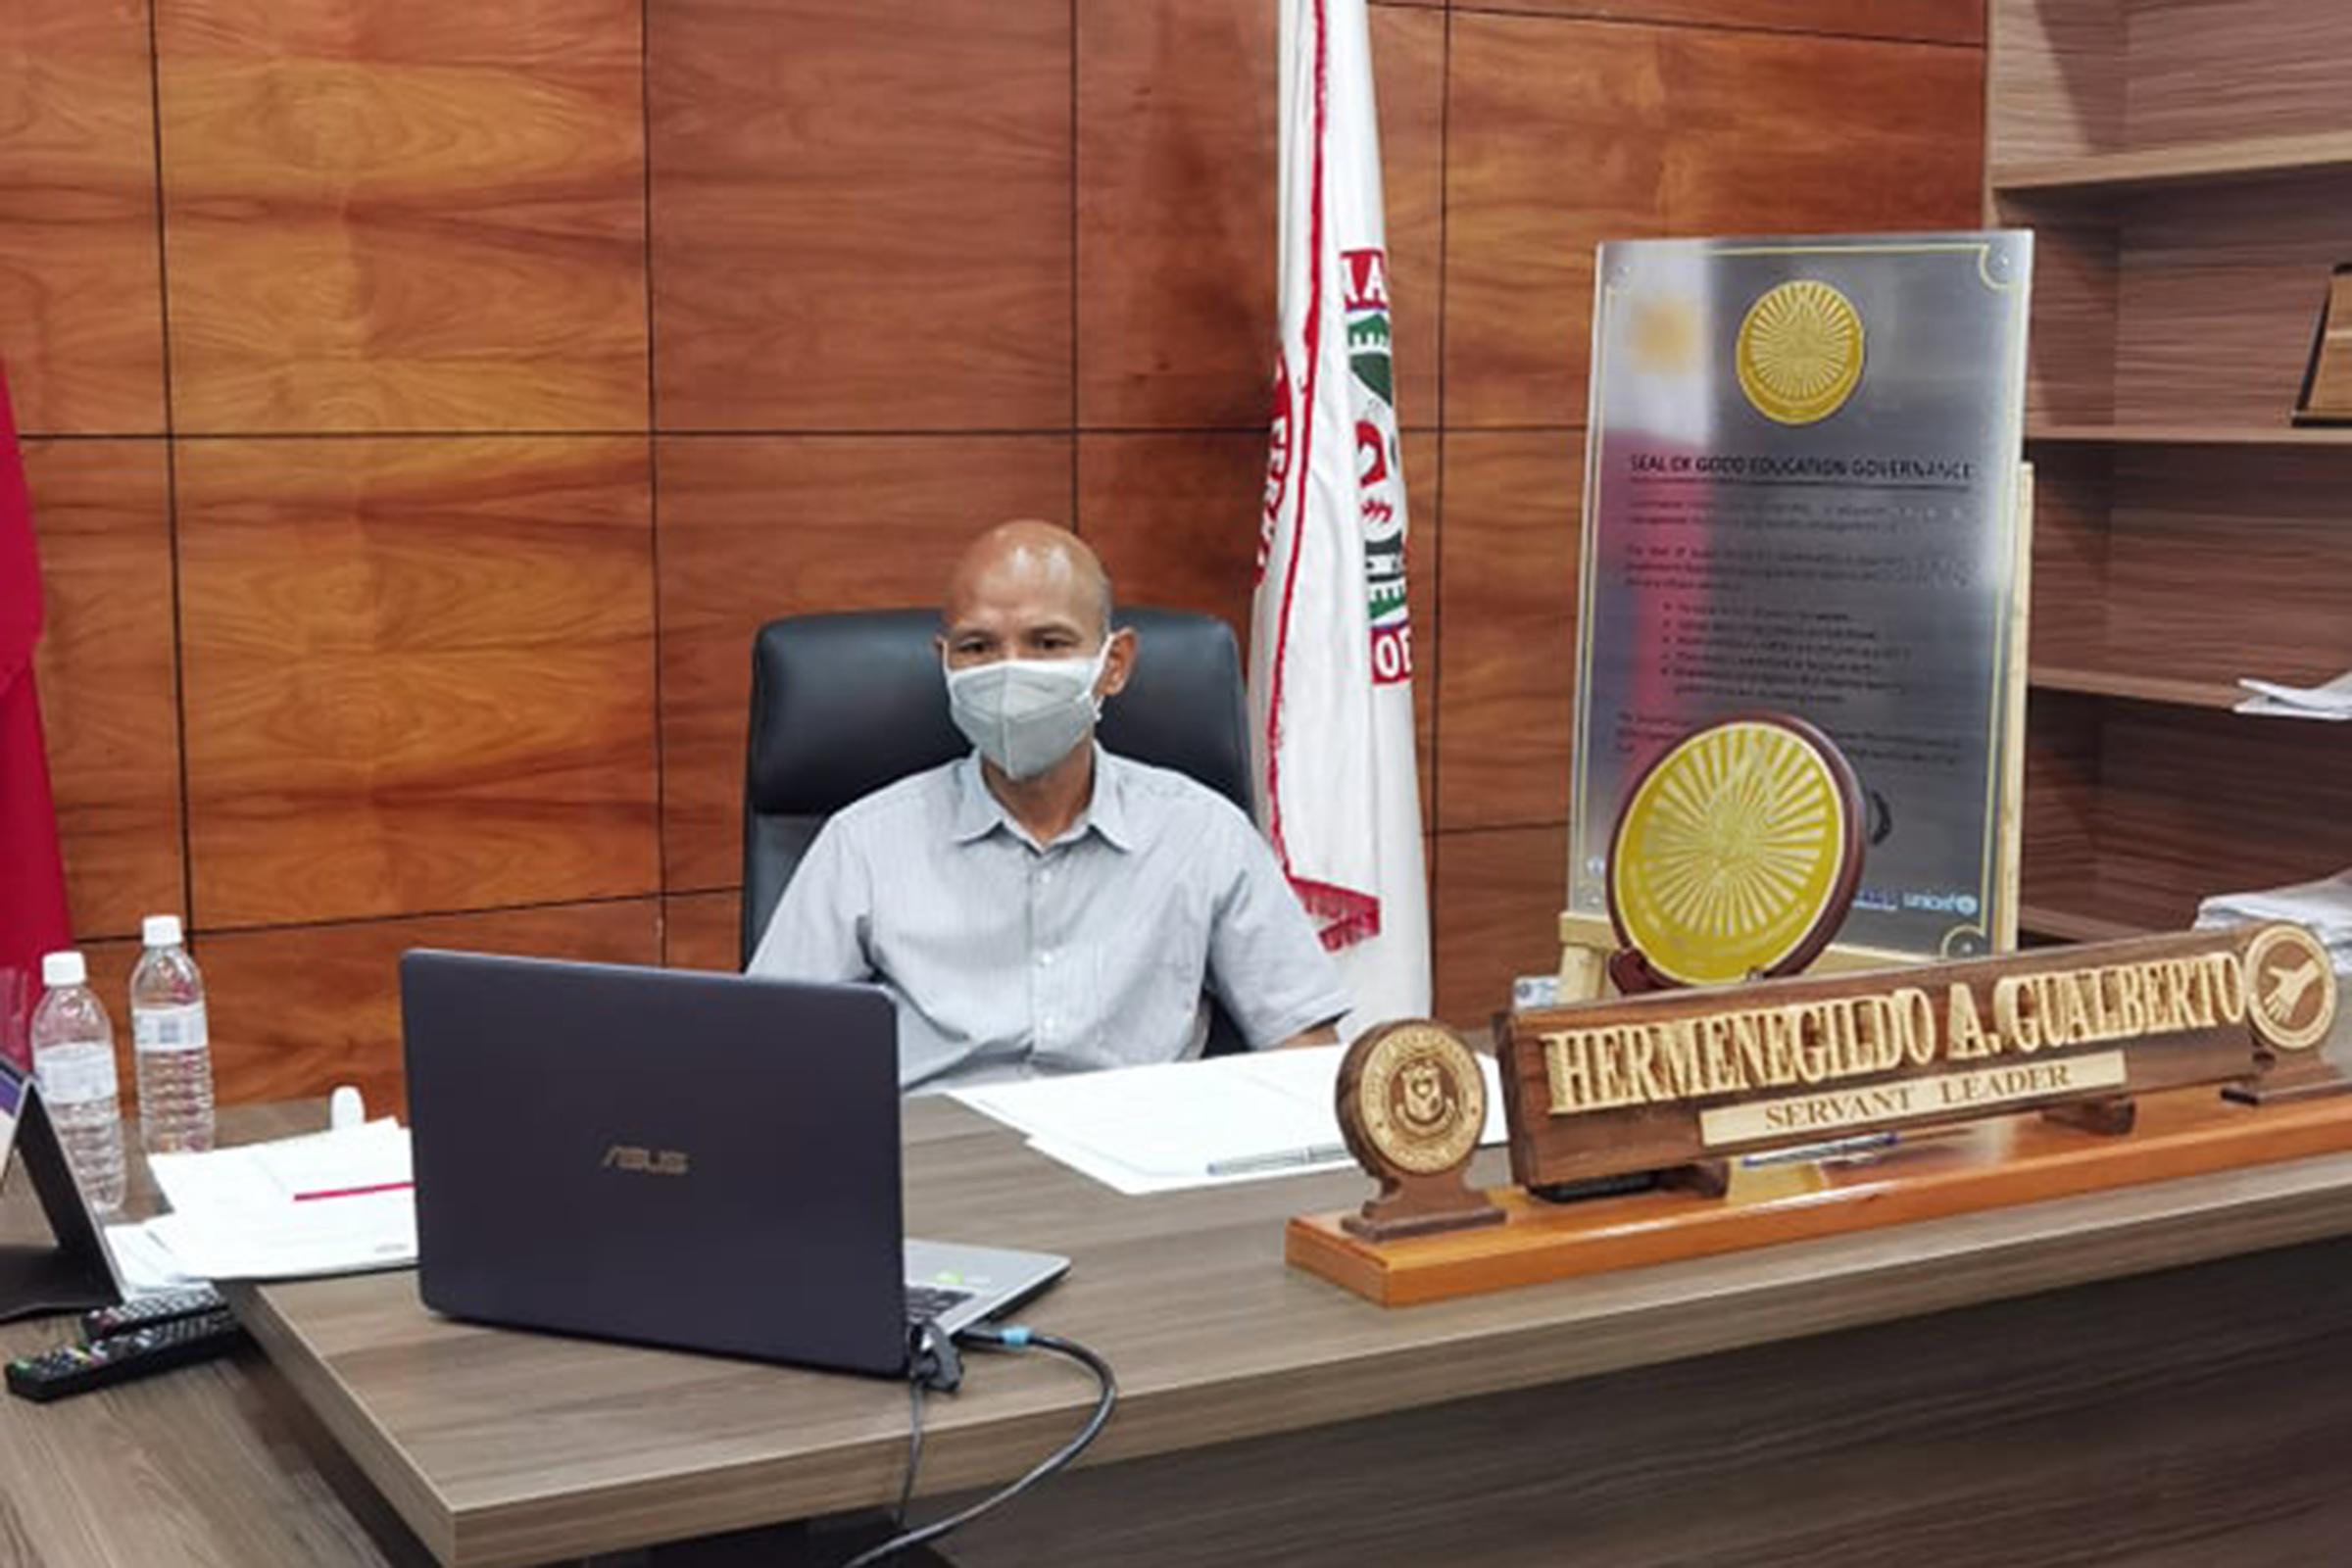 San Fernando garners 2021 Seal of Good Education Governance